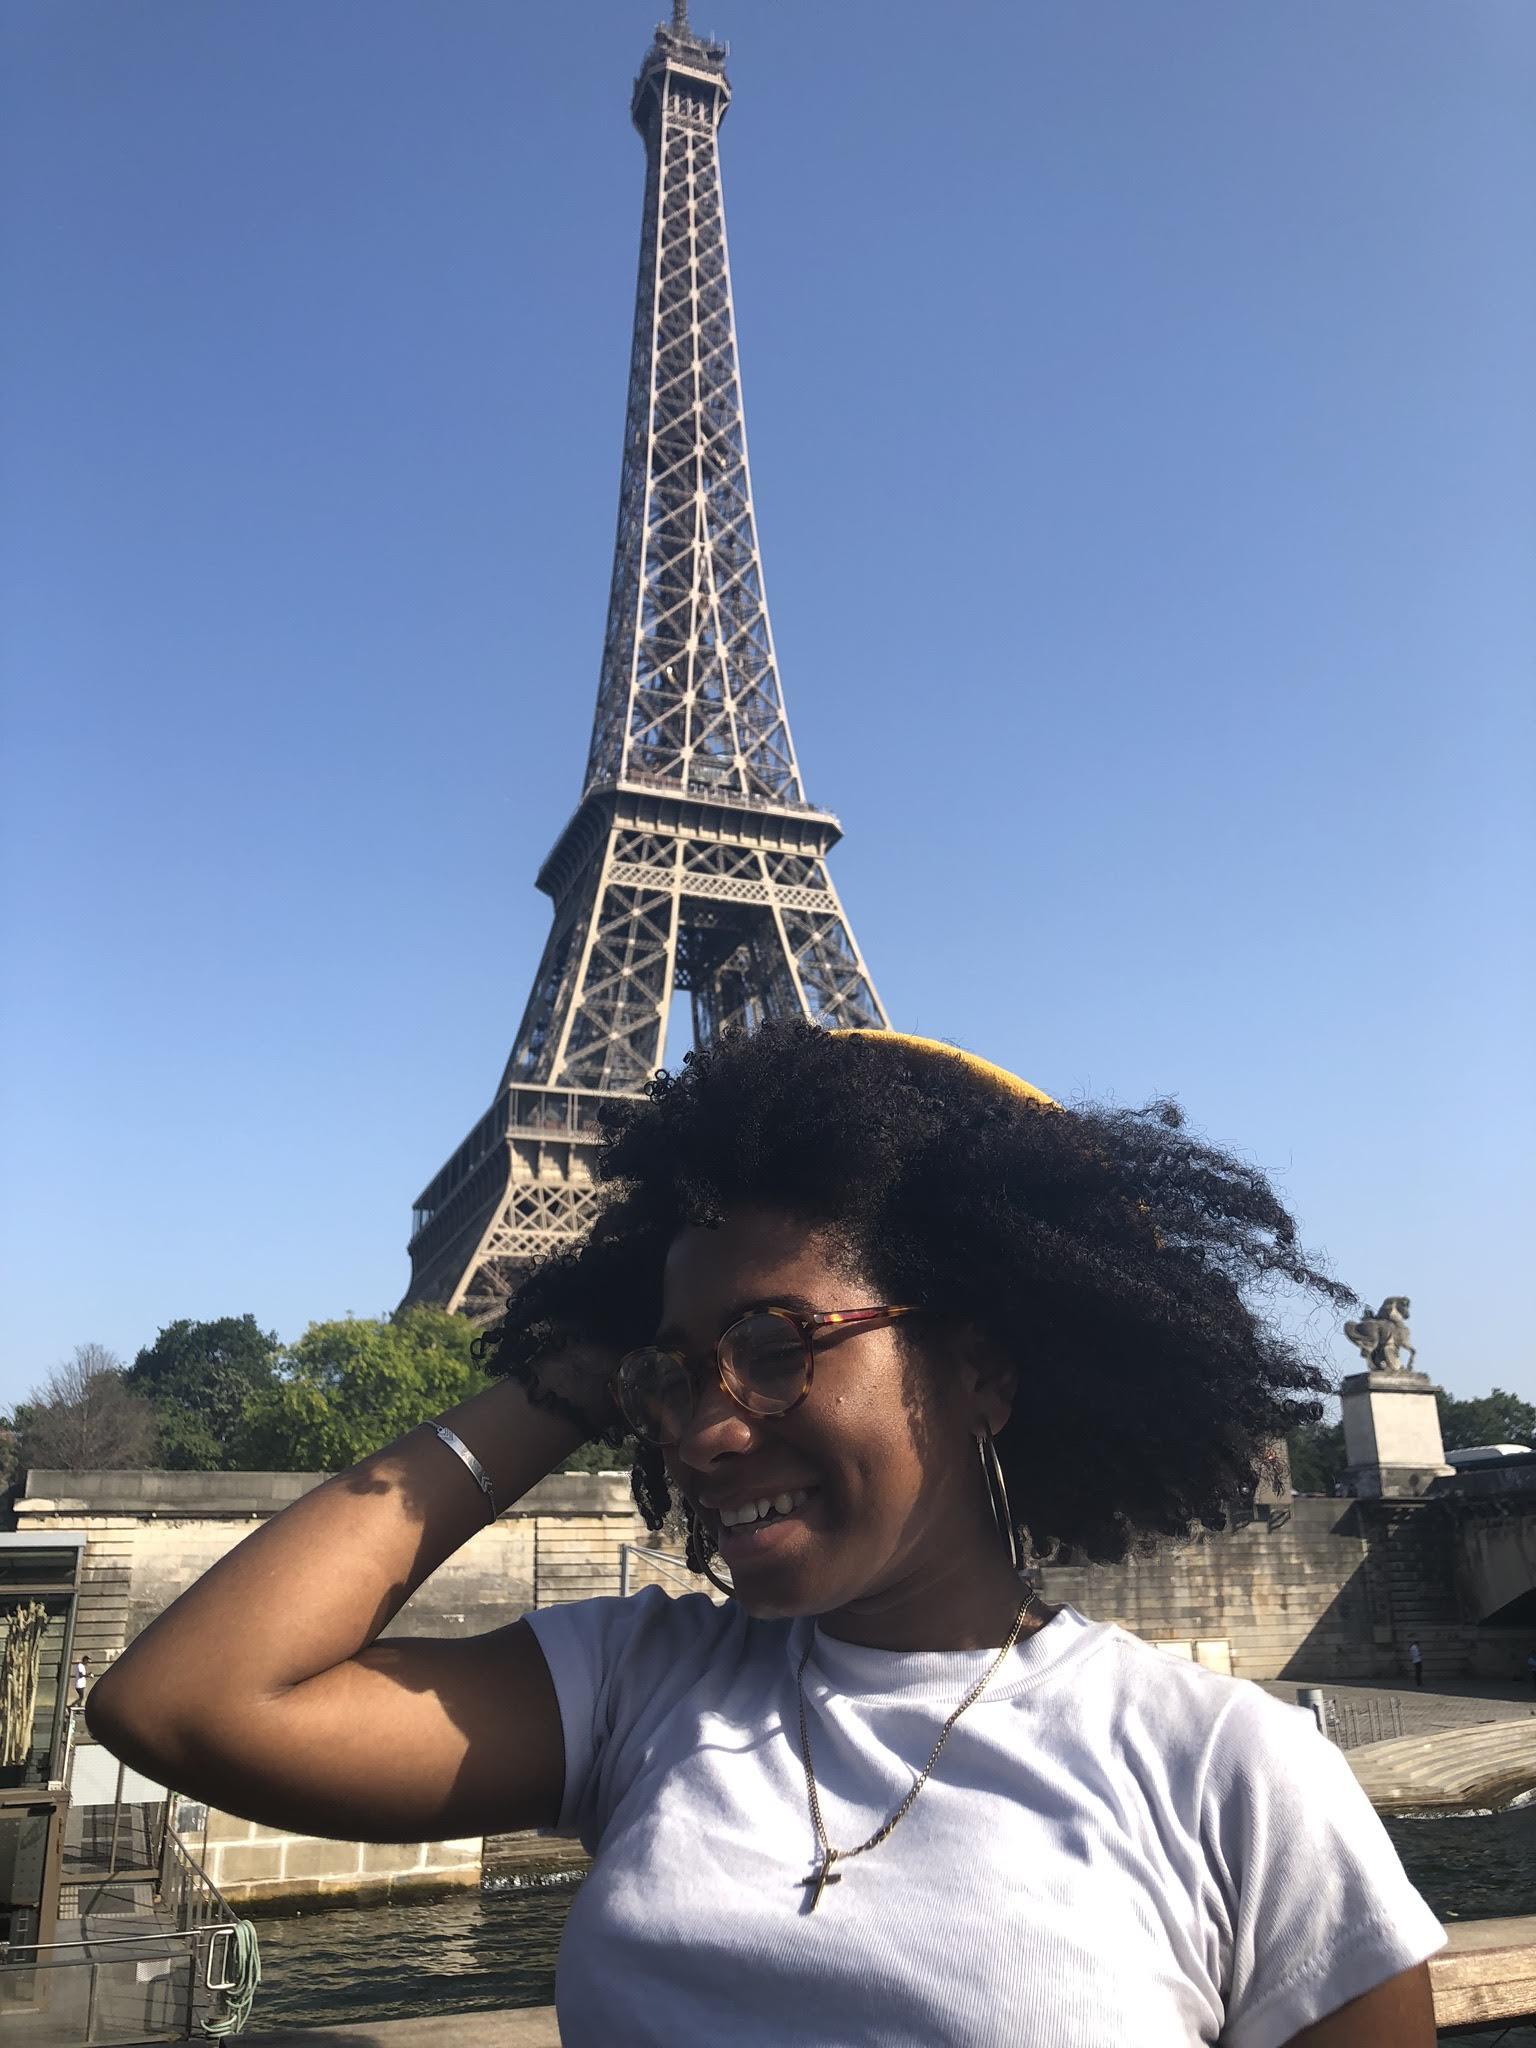 Makayla Nicholas in front go the Eiffel Tower in Paris.